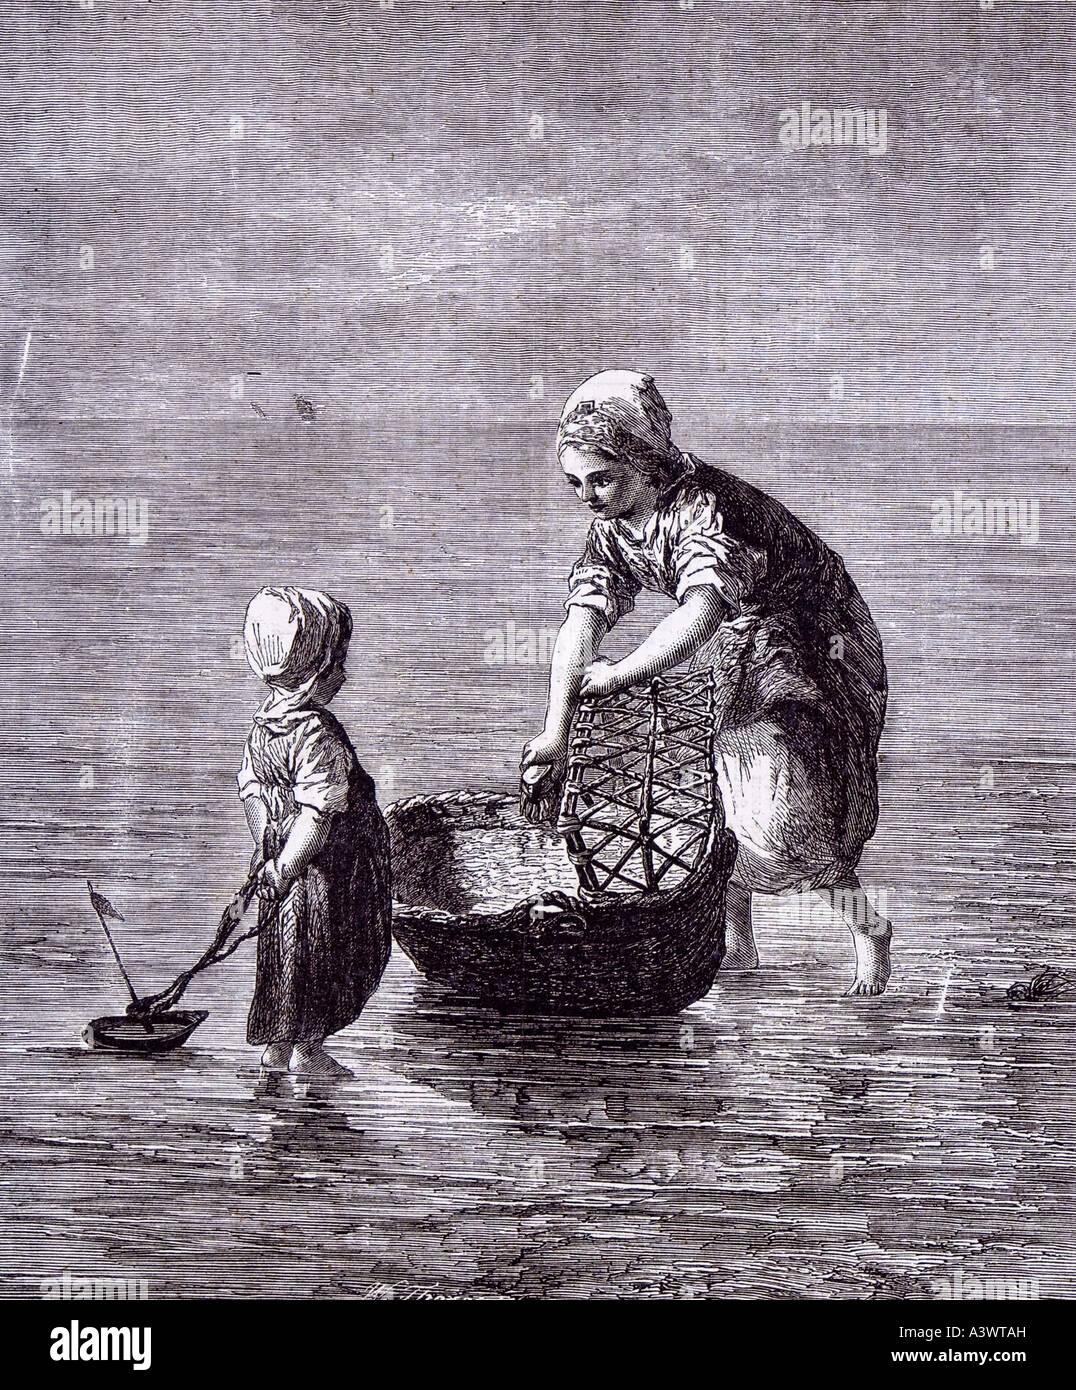 dutch artist art child sister sea boat moses basket baby bed cot crib babyhood Stock Photo